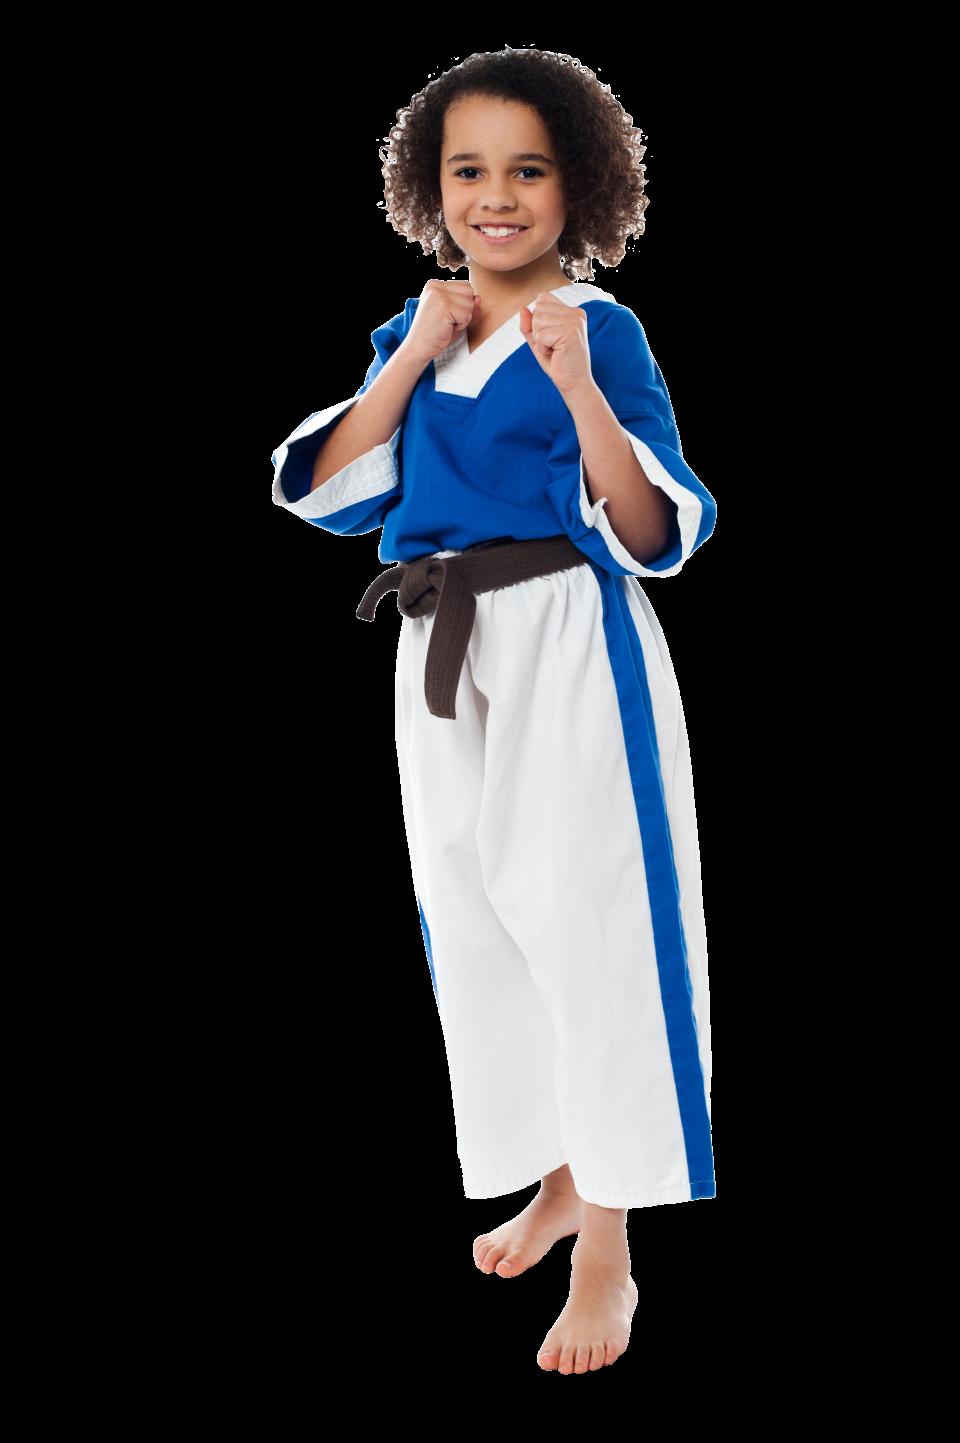 Karate Girl PNG Image